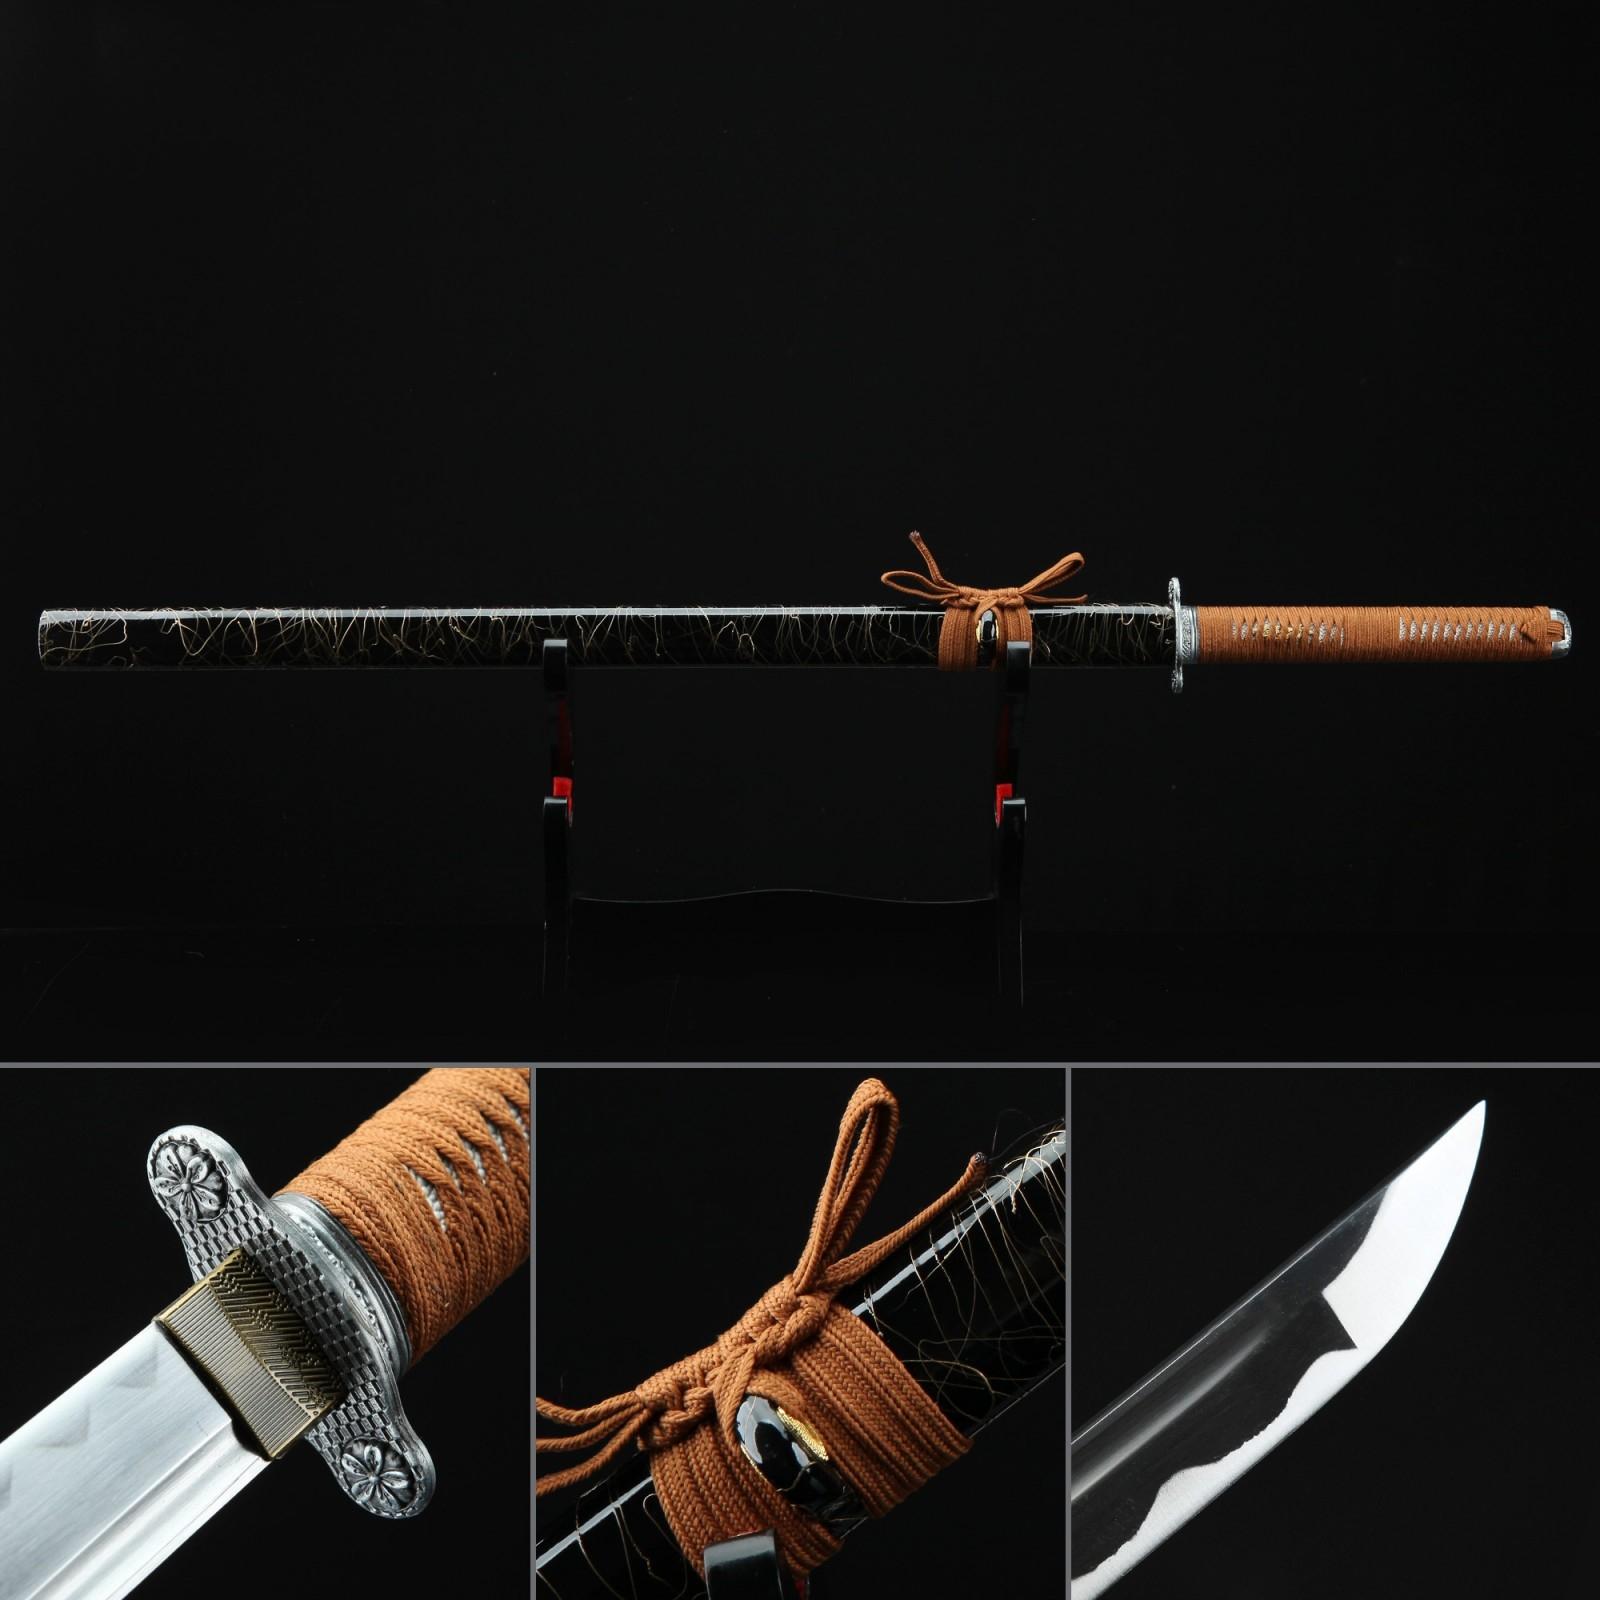 Silver Sakura Tsuba Theme Handmade Straight Katana Real Ninjato Ninja Swords